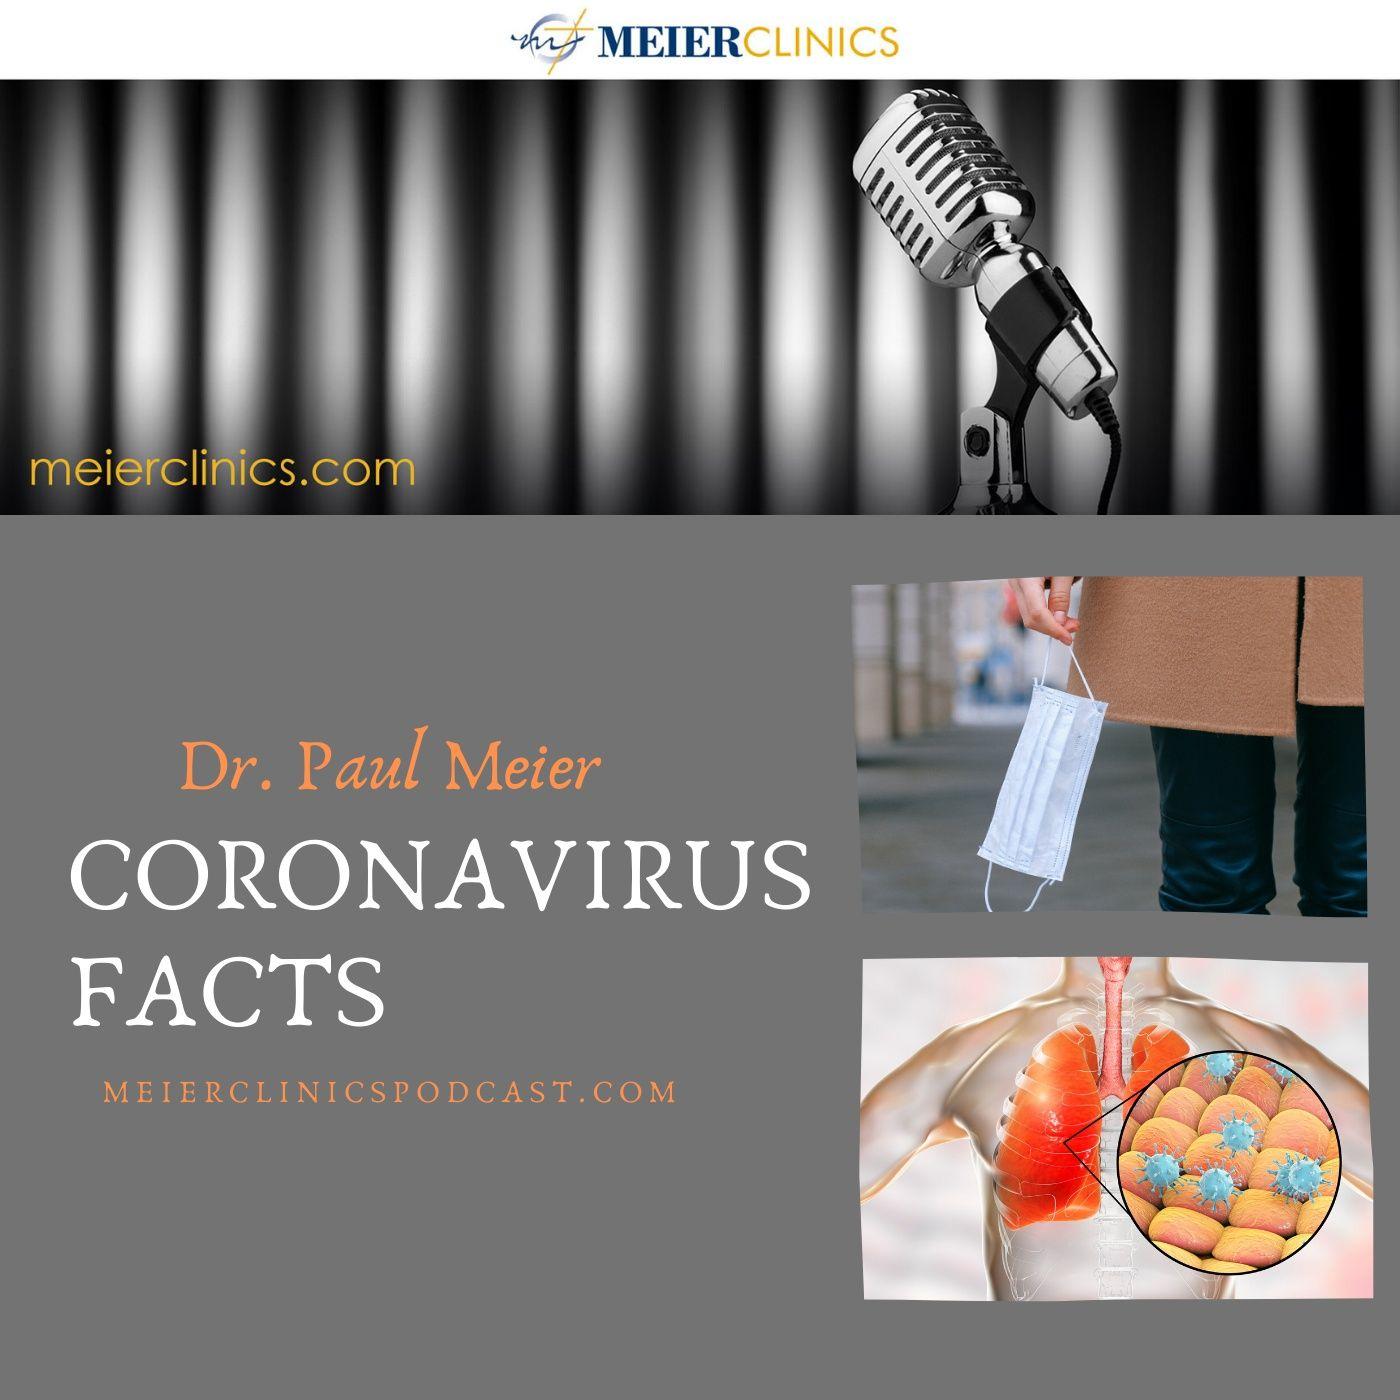 Coronavirus Facts with Dr. Paul Meier